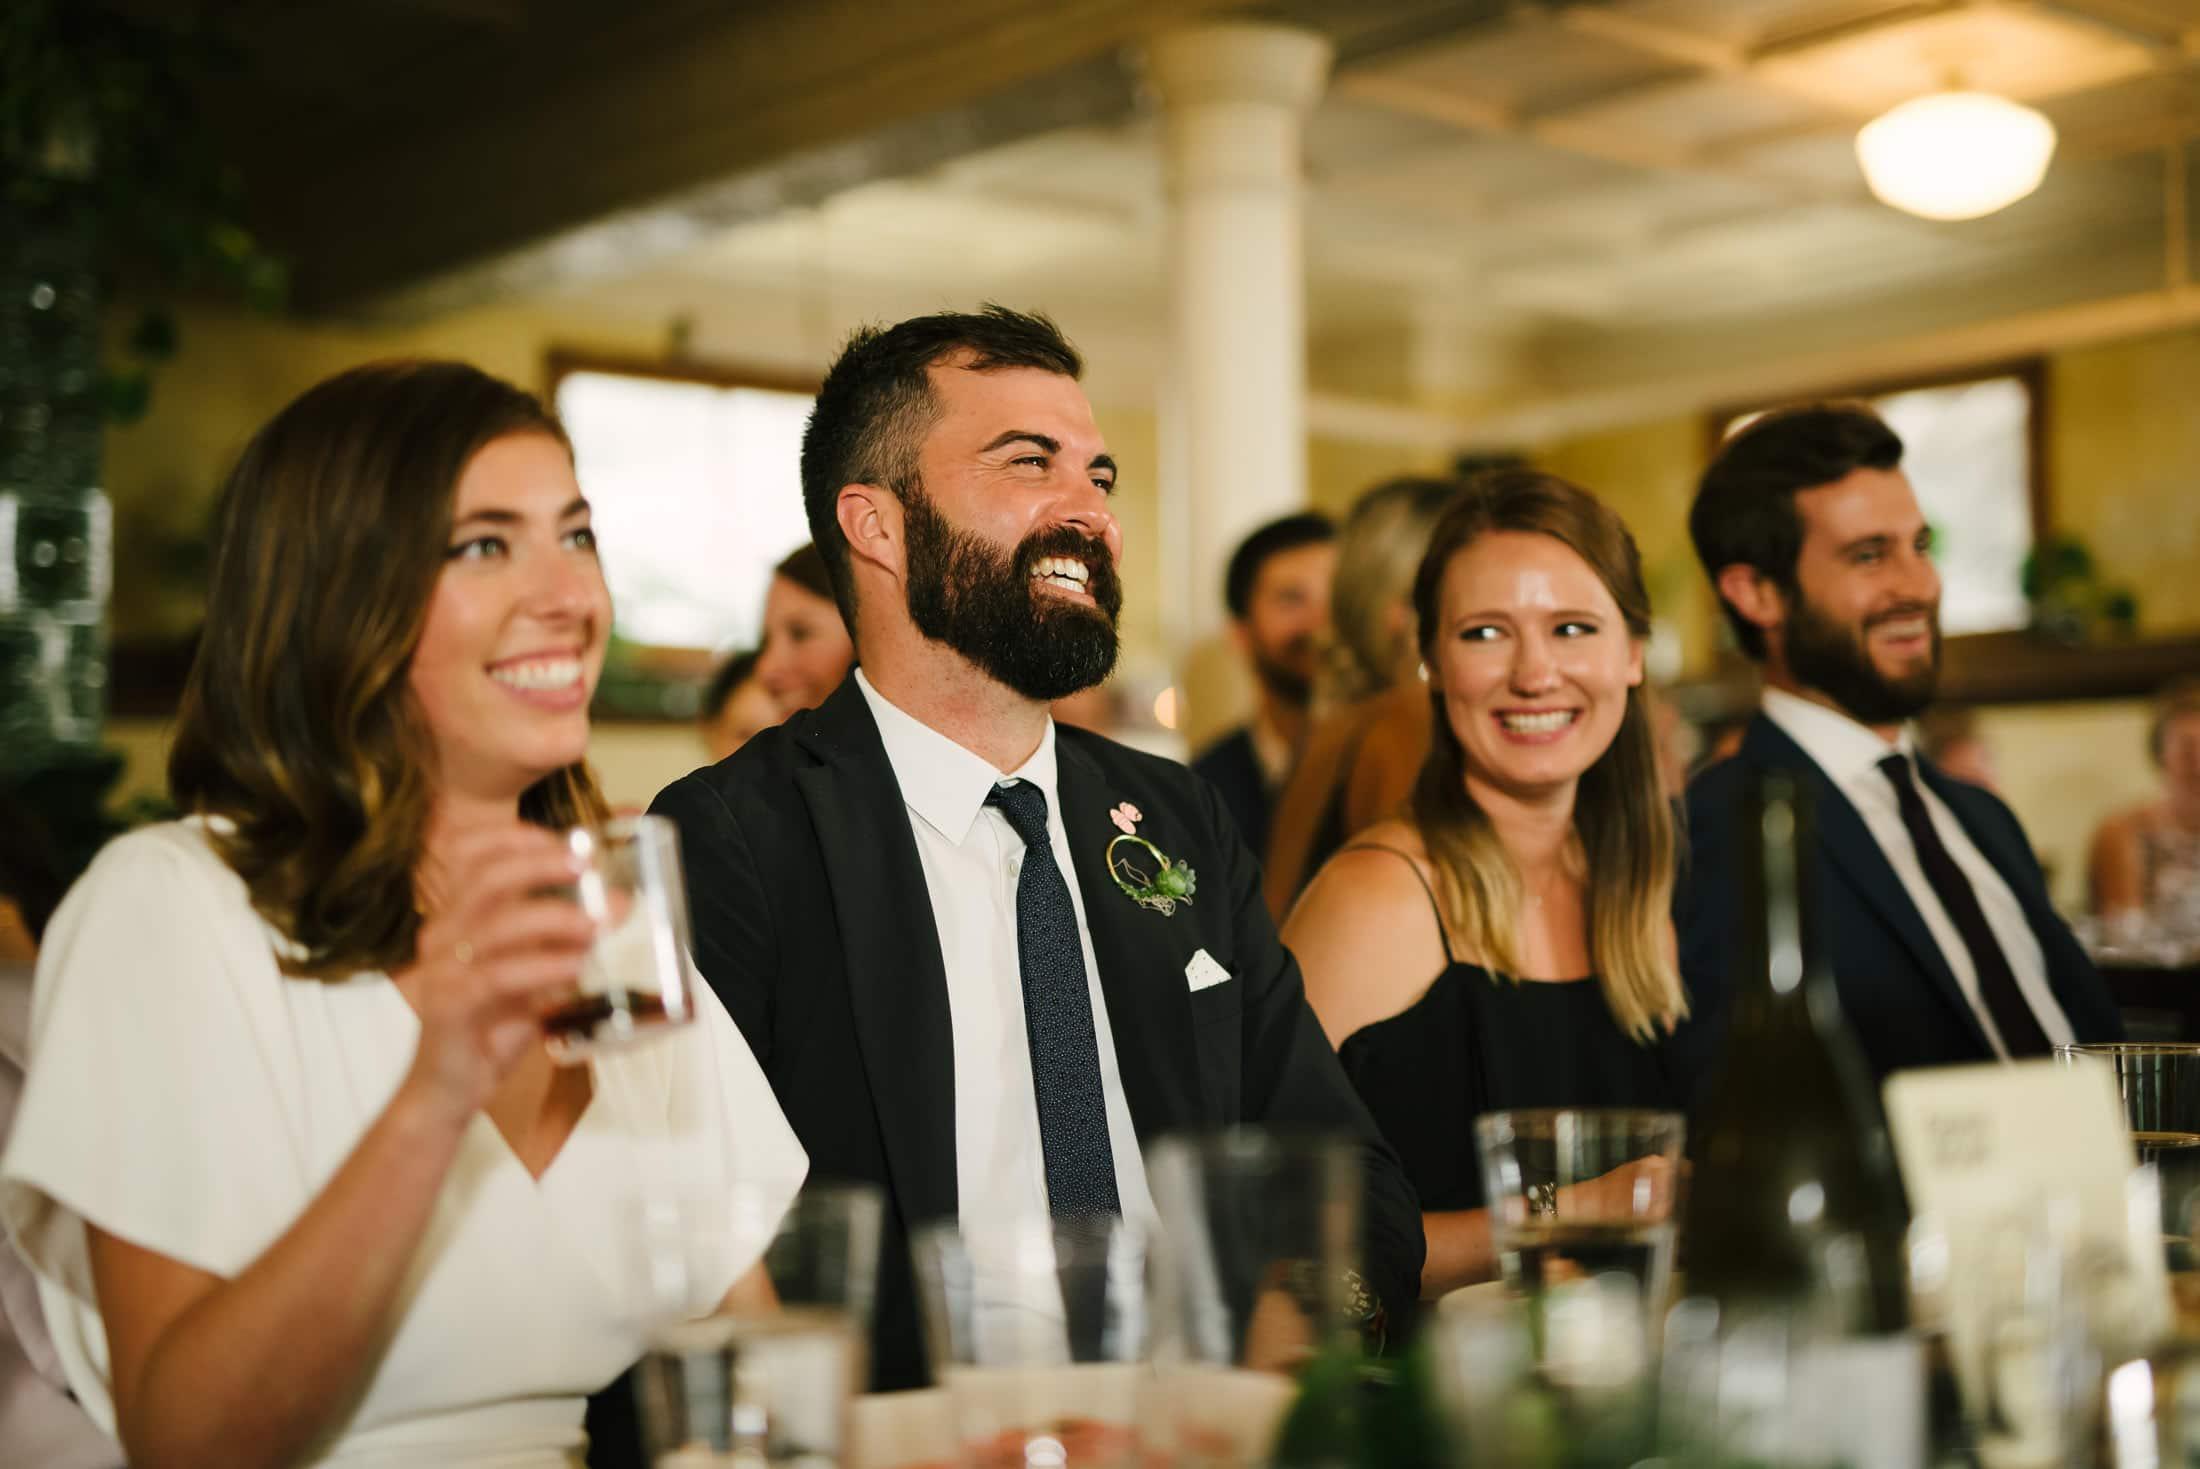 Marin Headland Center for the Arts Wedding dinner